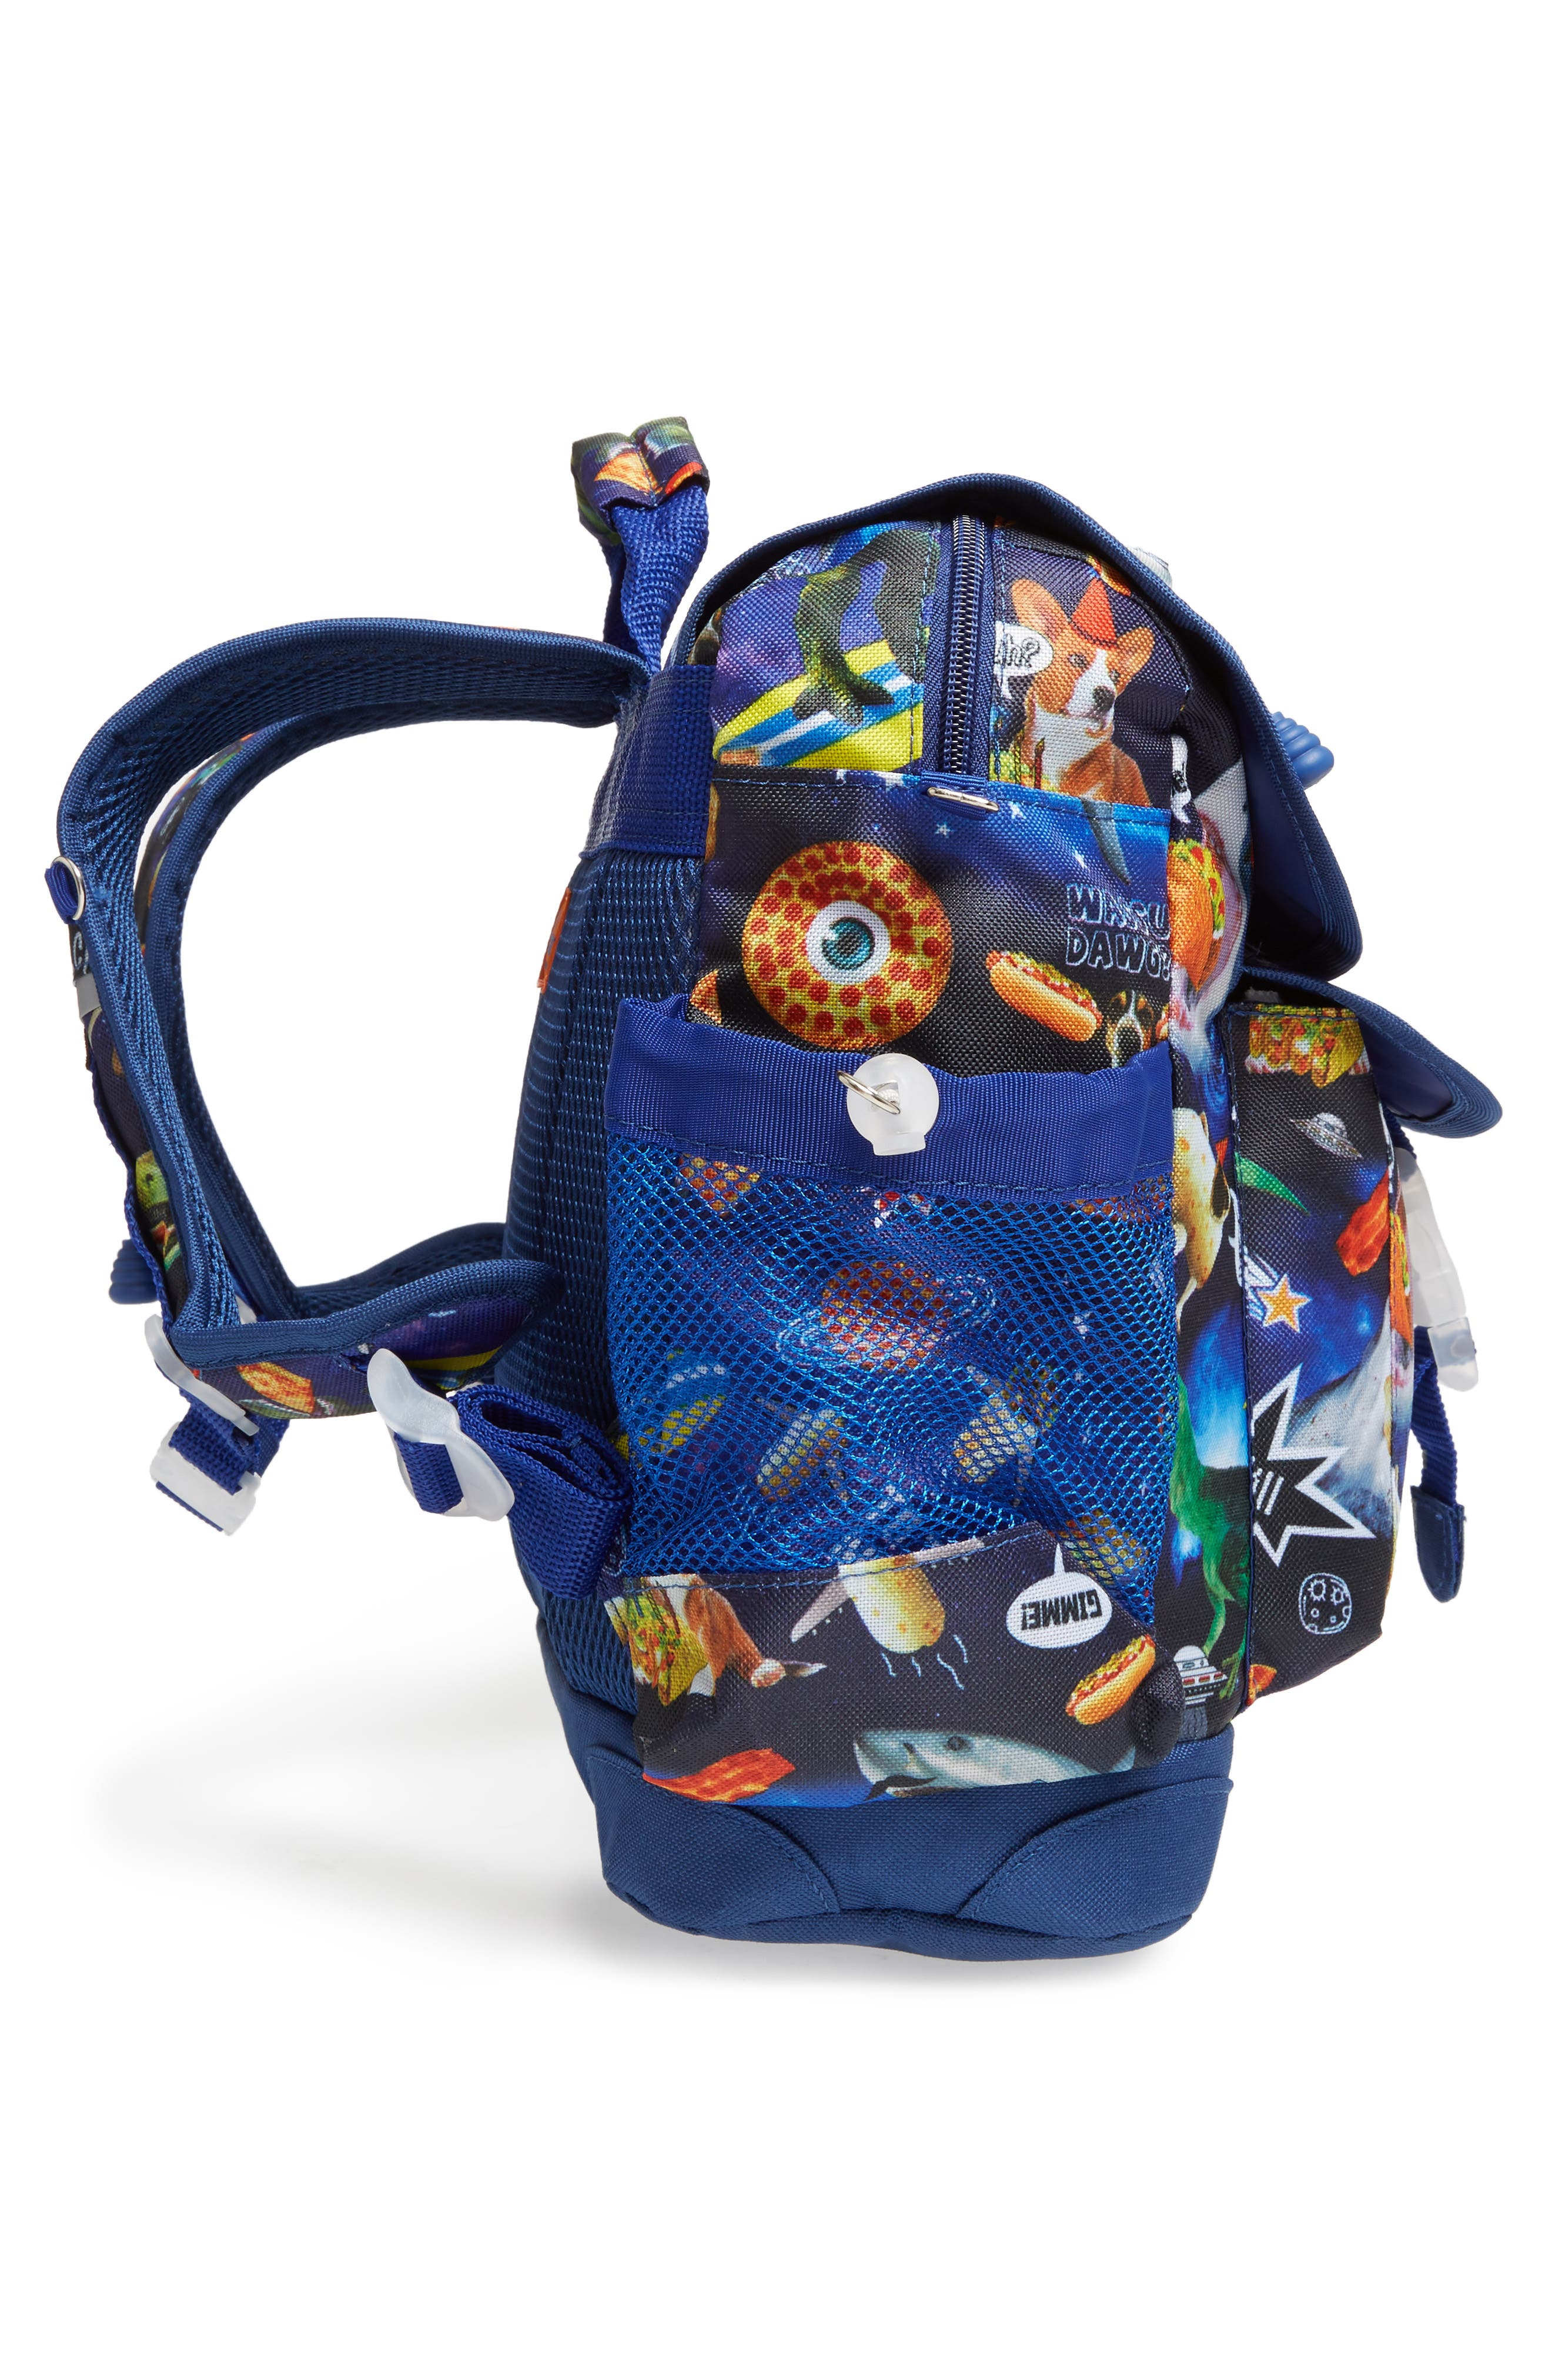 Meme Space Odyssey Backpack,                             Alternate thumbnail 4, color,                             400